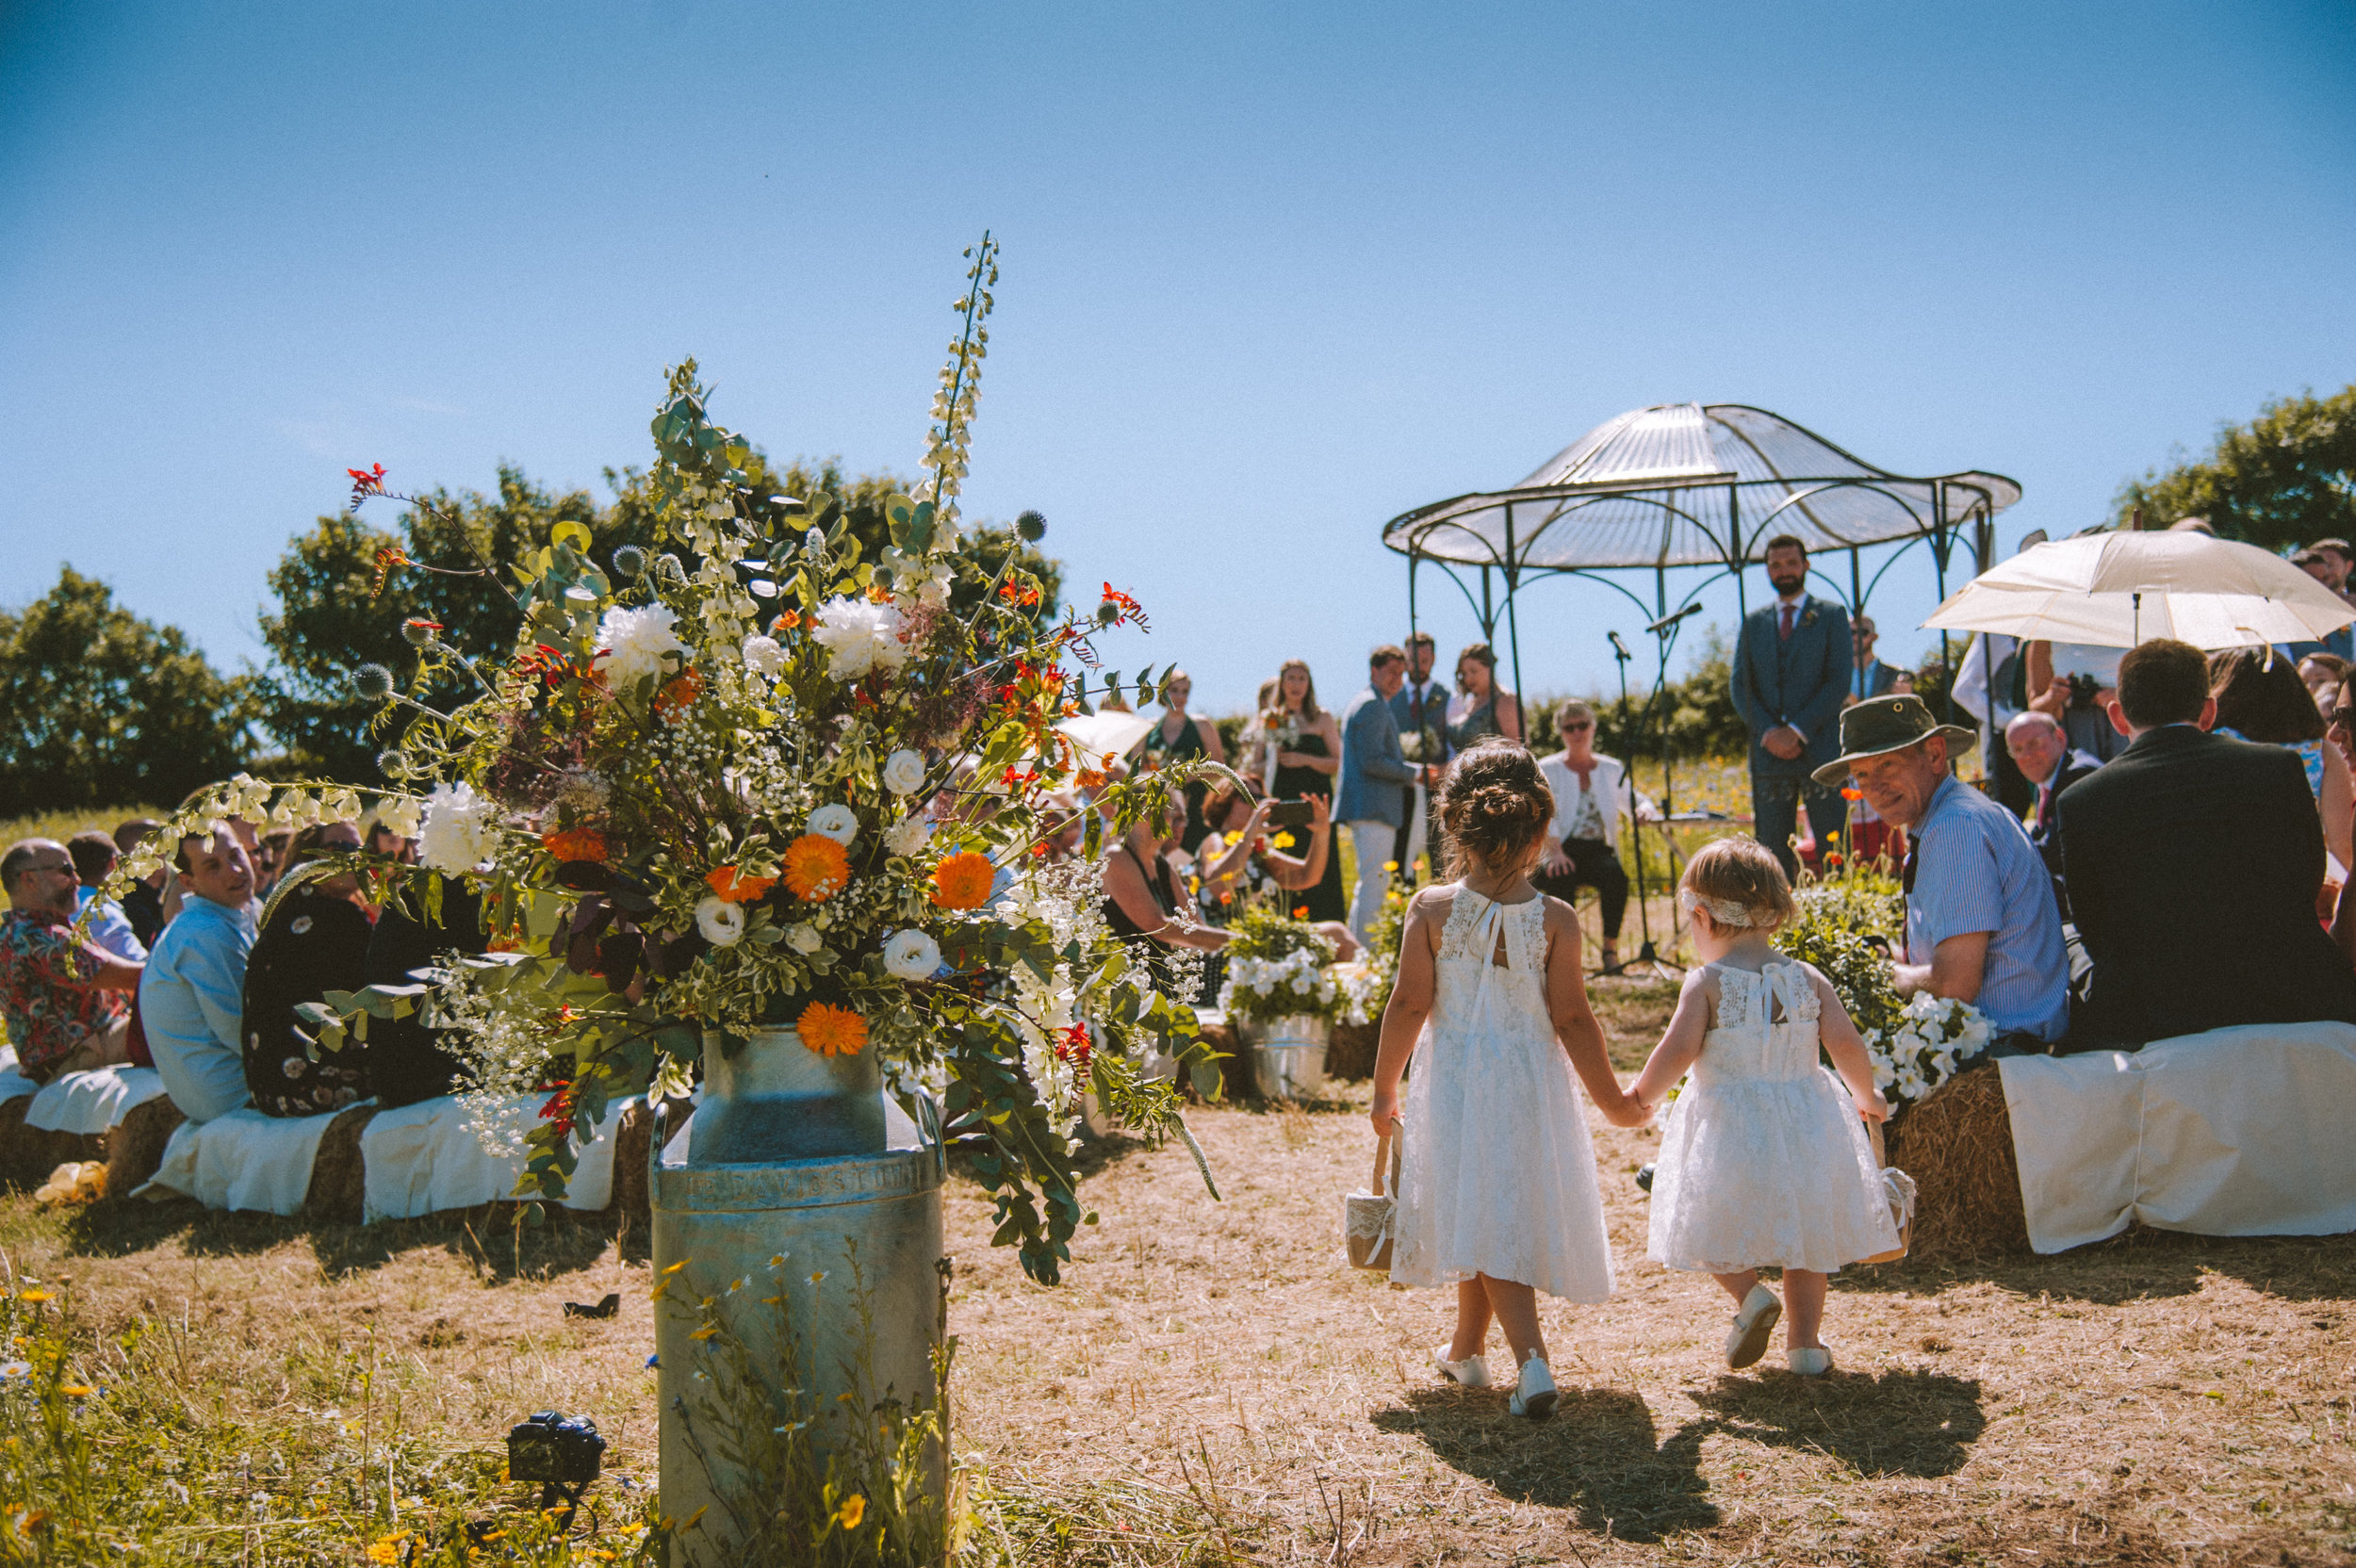 ash-barton-estate-wedding-photographer-mark-shaw-20.jpg